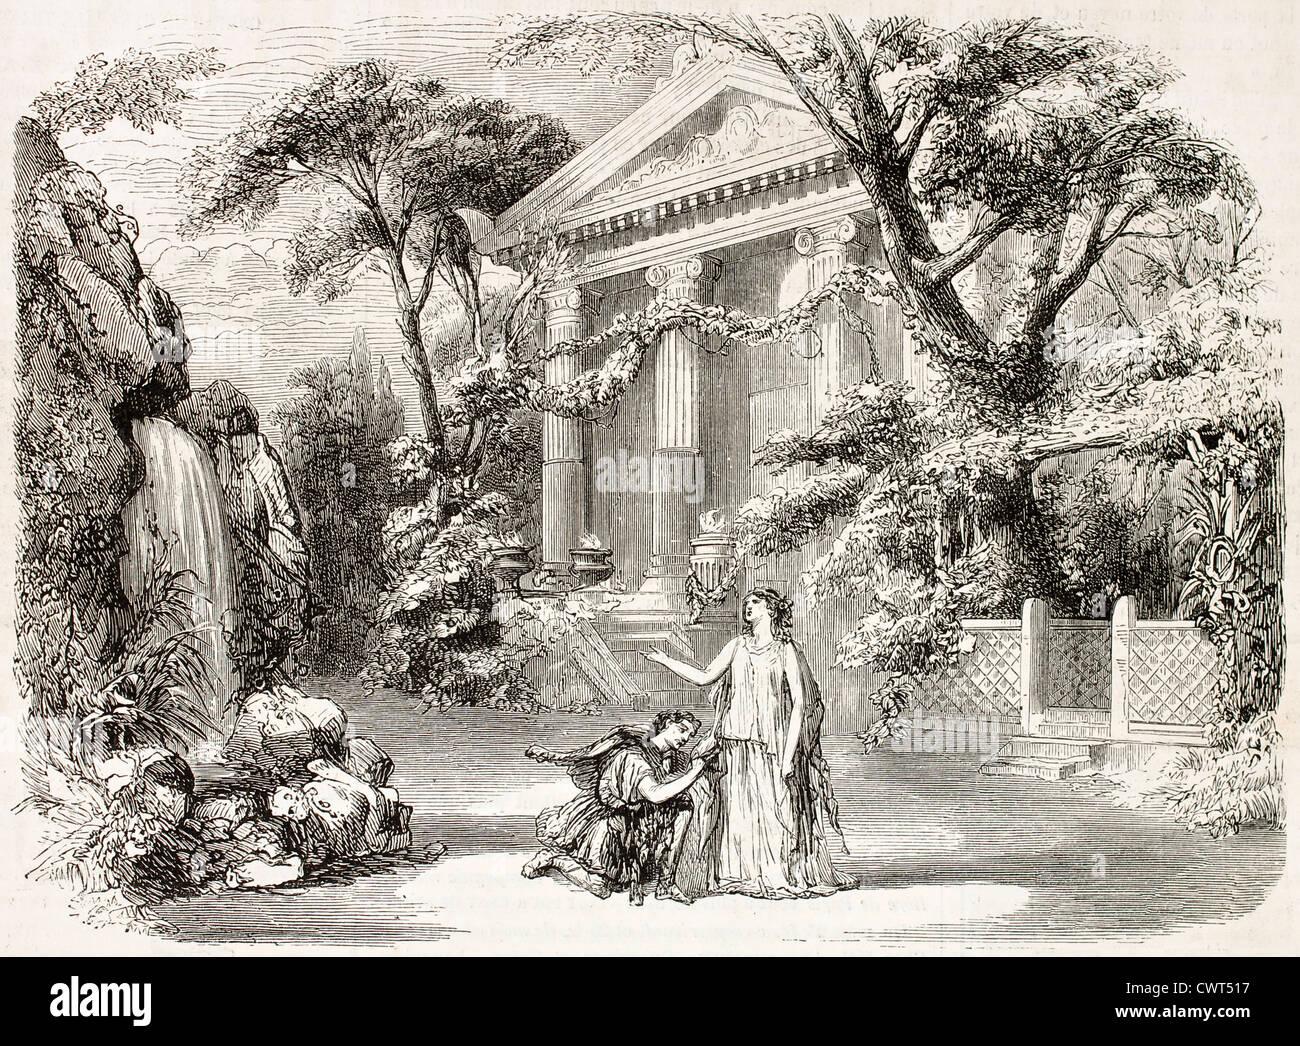 The Goddess and the Shepherd - Stock Image